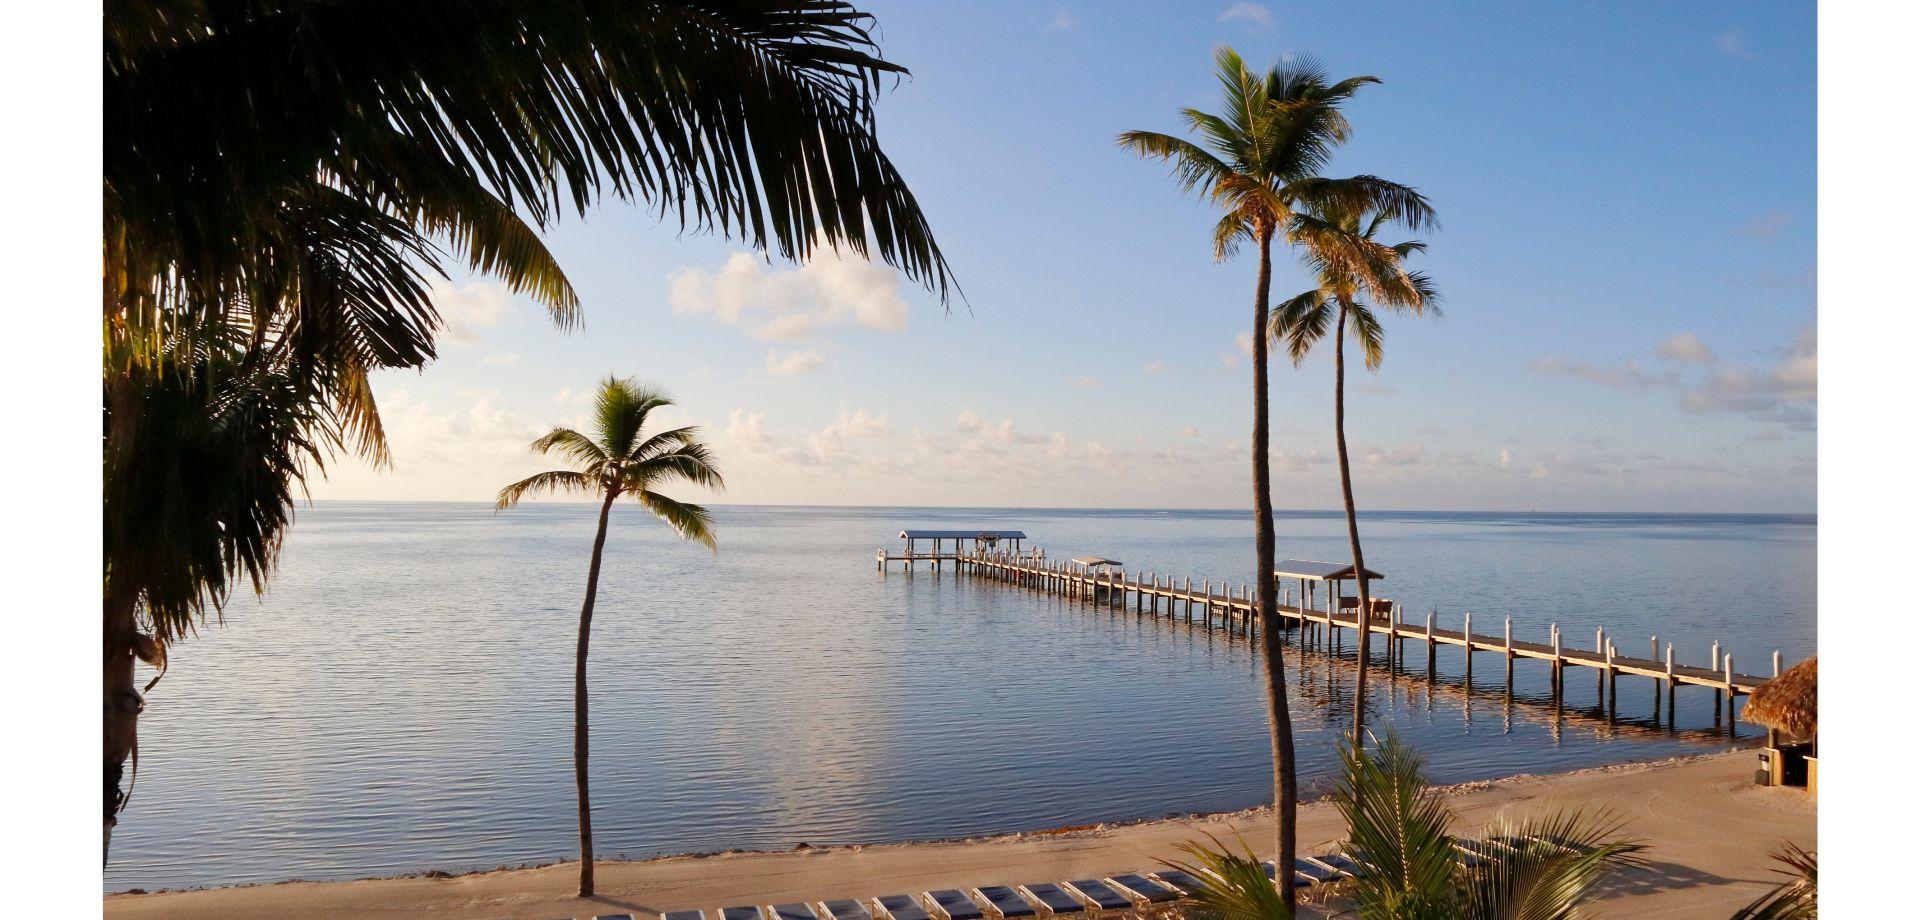 Florida Keys Resorts in Islamorada | Cheeca Lodge & Spa on hershey lodge map, kalaloch lodge map, snake river lodge map, el silencio lodge map, stein eriksen lodge map, cedar breaks lodge map, yosemite lodge map, stowe mountain lodge map,